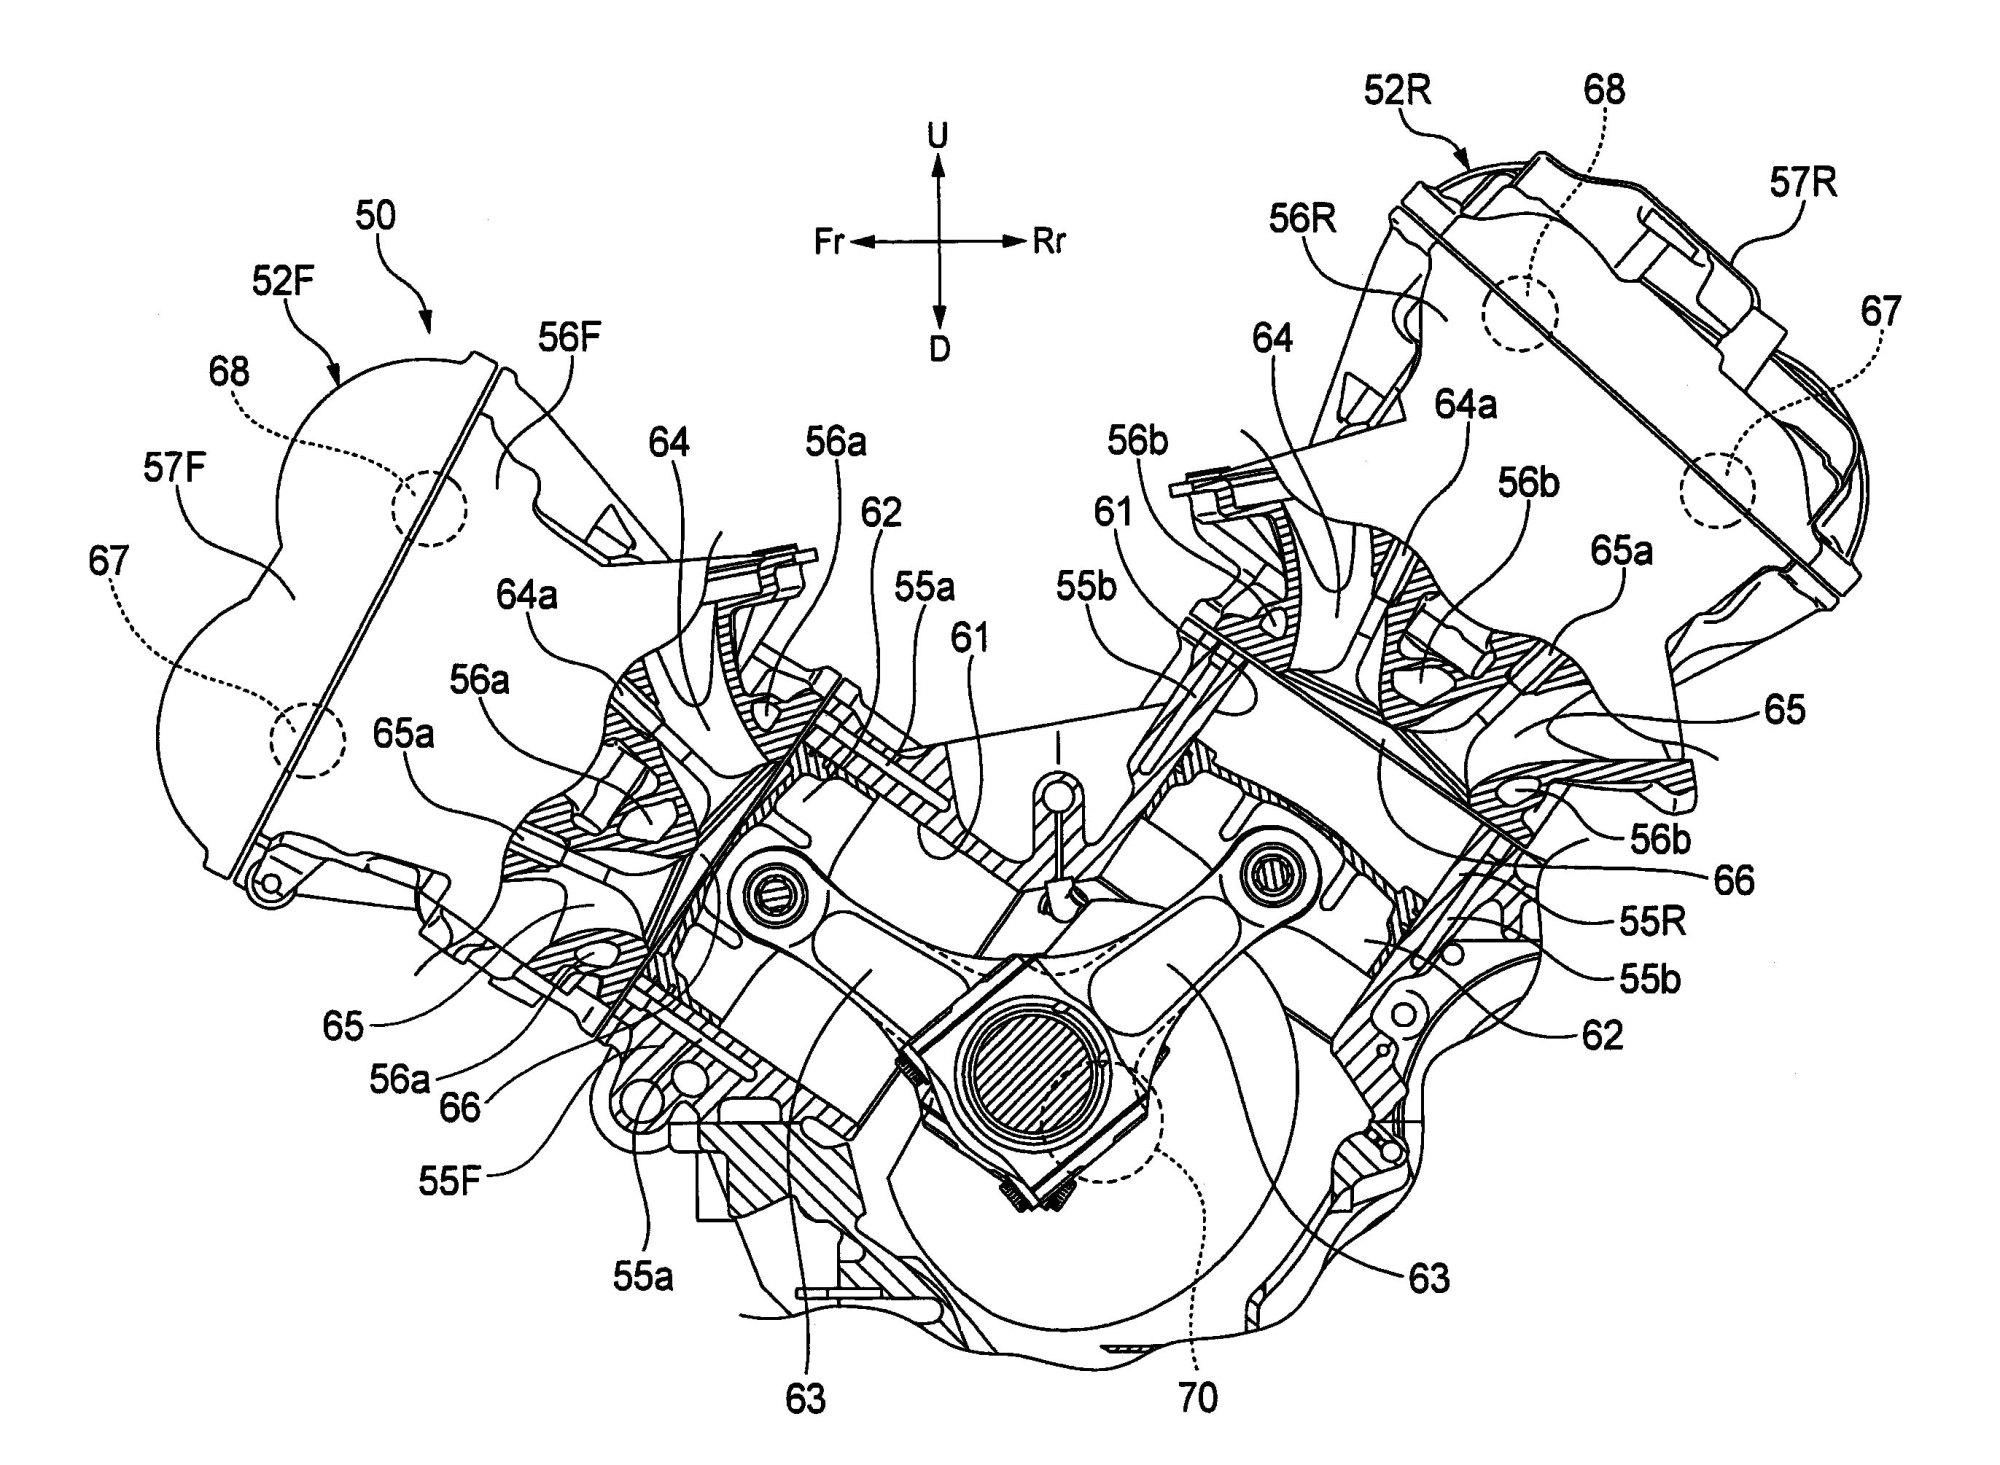 hight resolution of honda v4 superbike engine outed in patent photos asphalt ducati 1198 engine diagram ducati monster engine